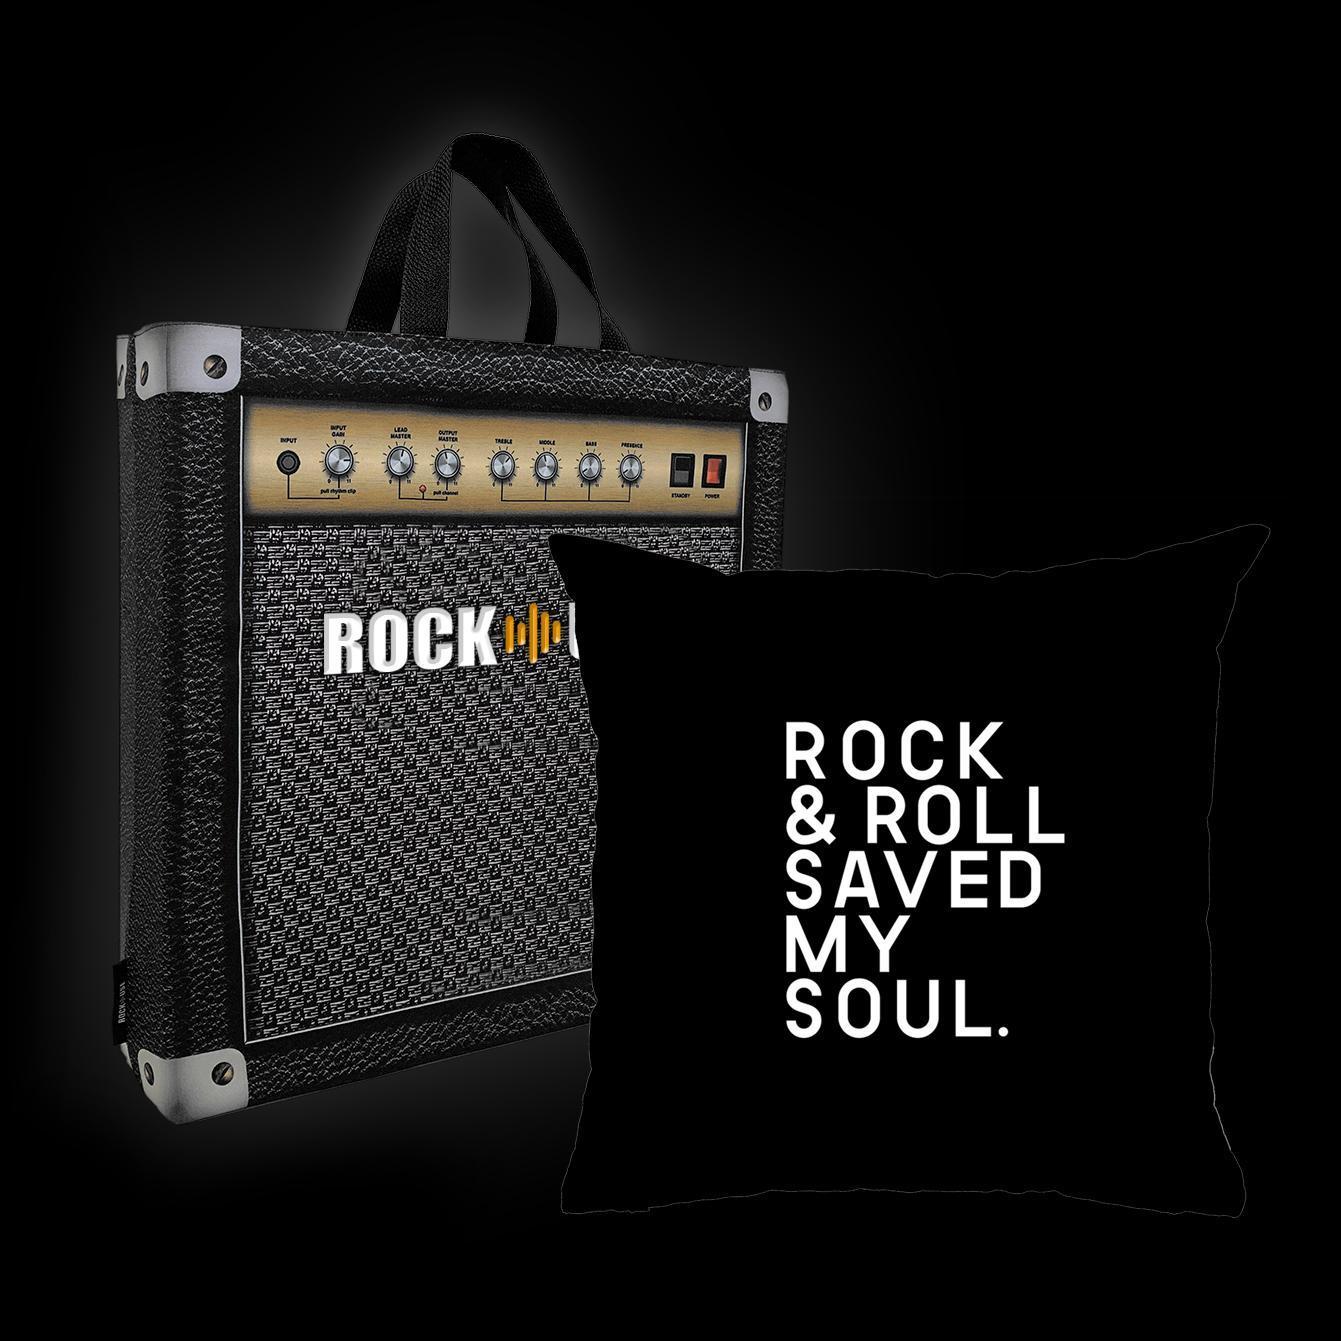 Kit Almofada & Sacola Rock Use - Rock & Roll Saved My Soul - Preta